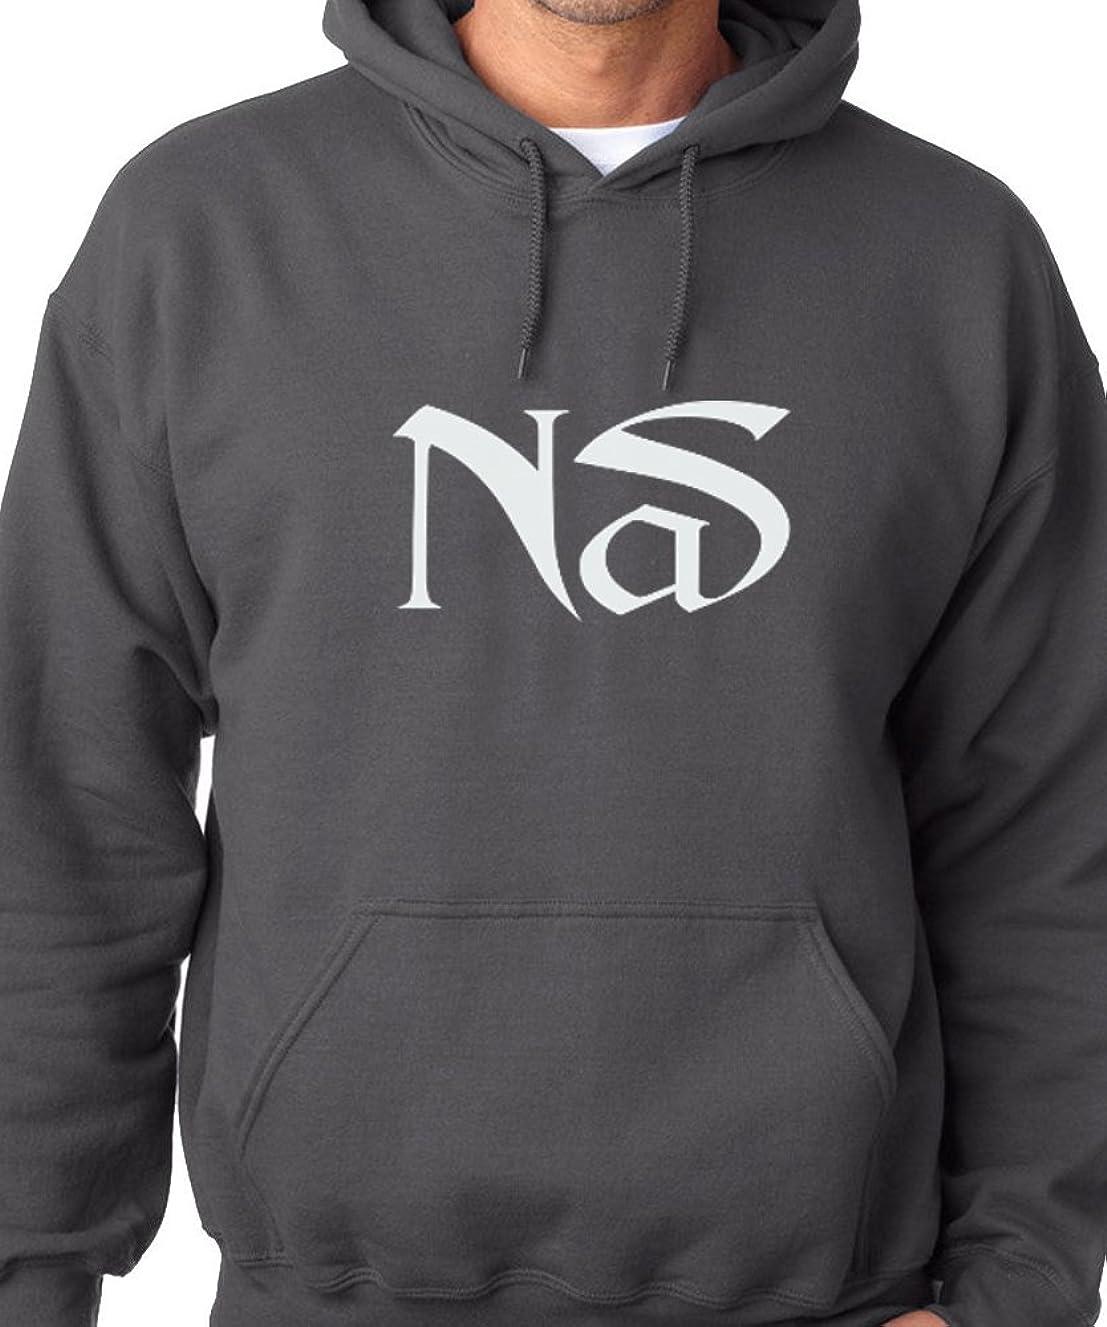 Nas Hip Hop Rap Sweatshirt Hoodie Classic Nasir Illmatic White Logo Charcoal (XL)